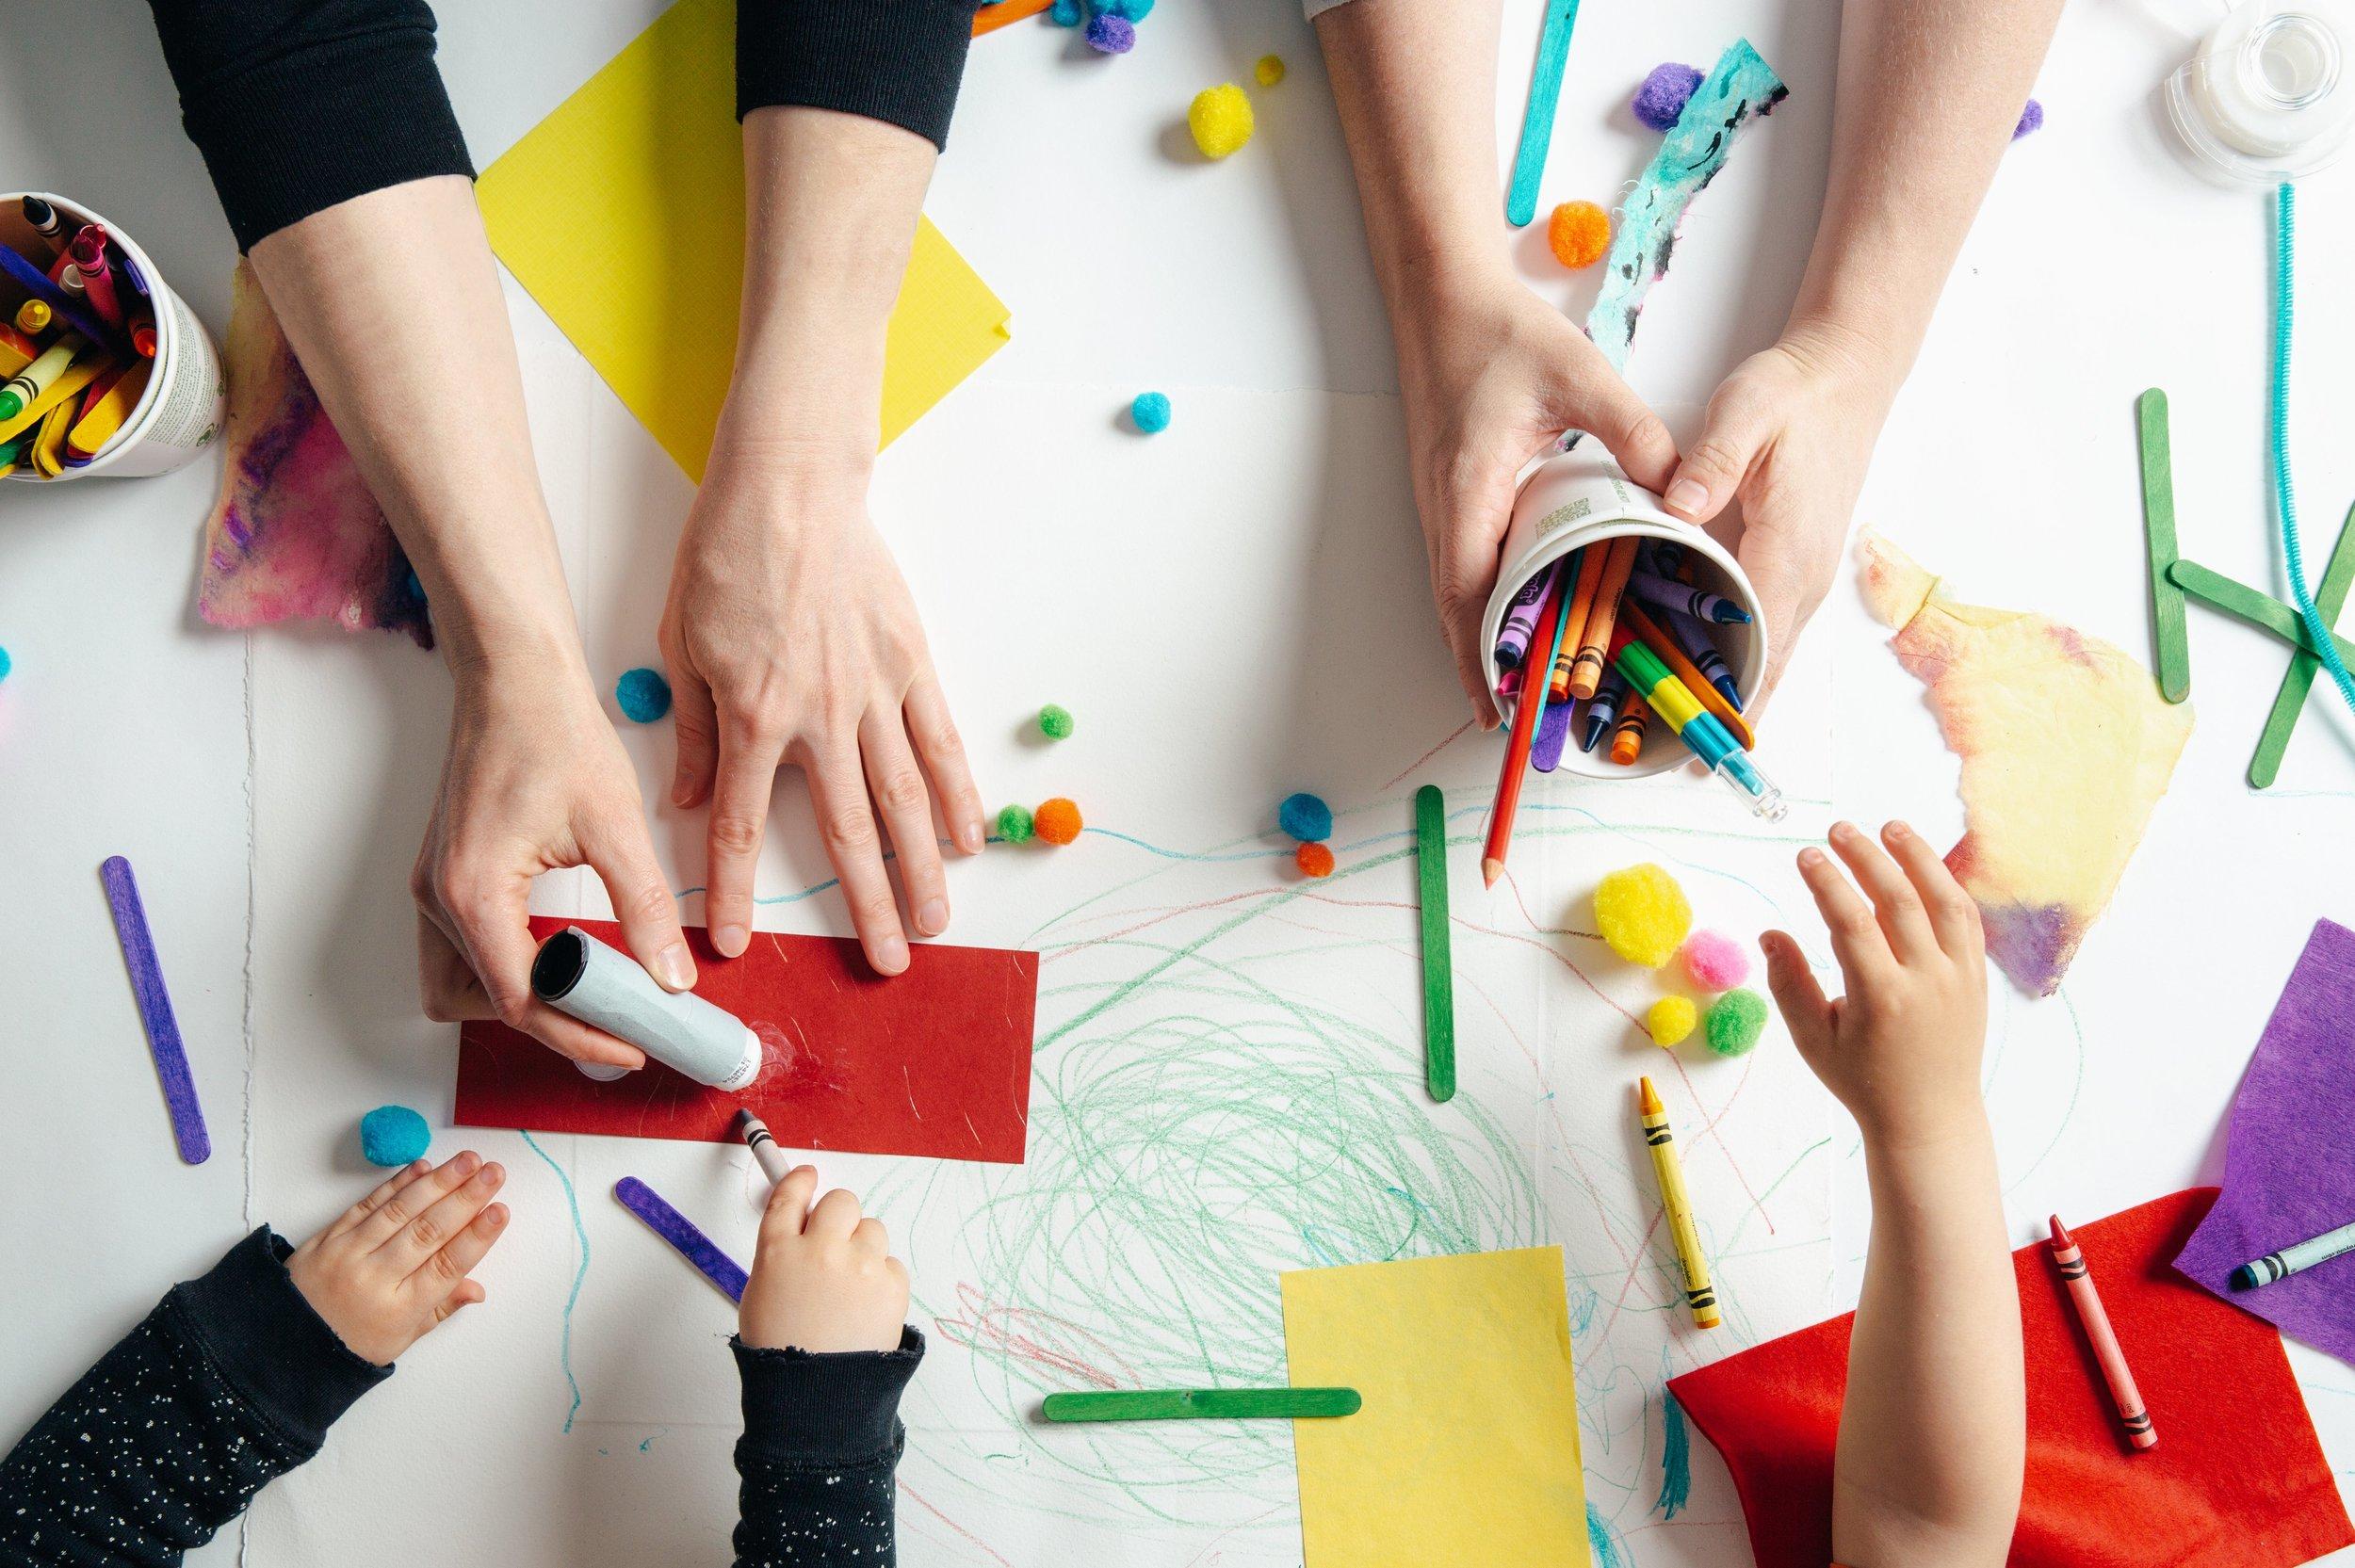 early-childhood-educators-and-kids-crafts-flatlay_4460x4460 burst.jpg